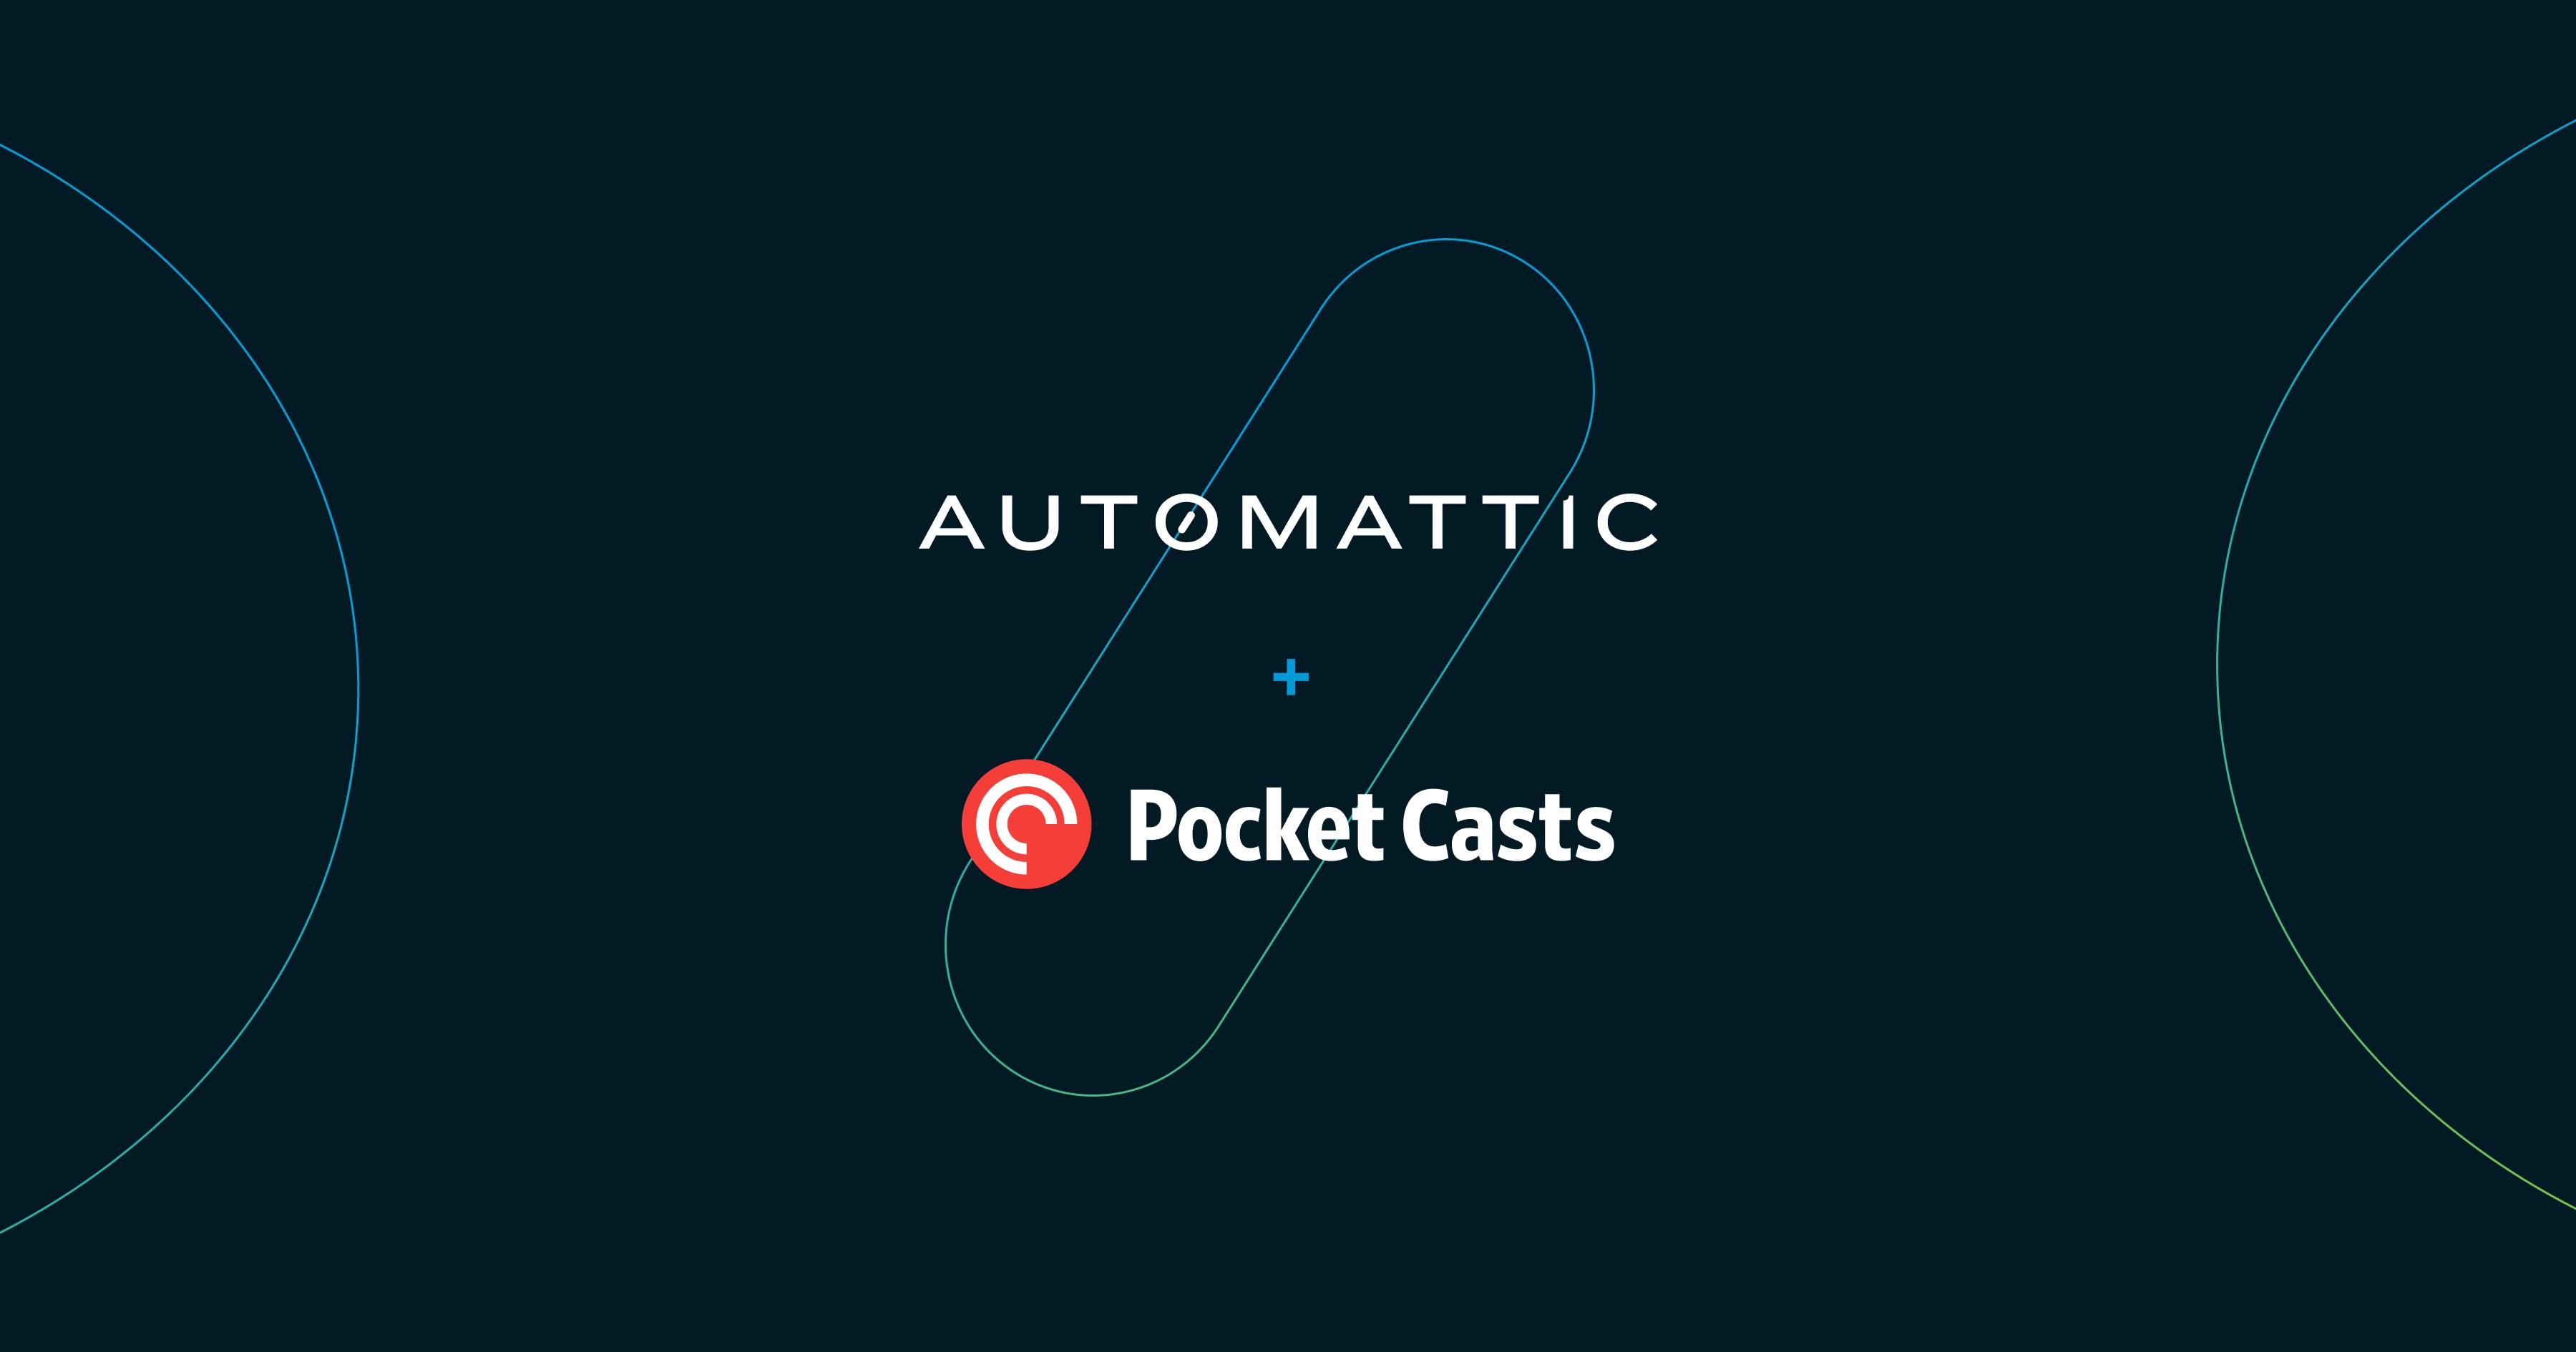 Popular Podcast App Pocket Casts Joins Automattic